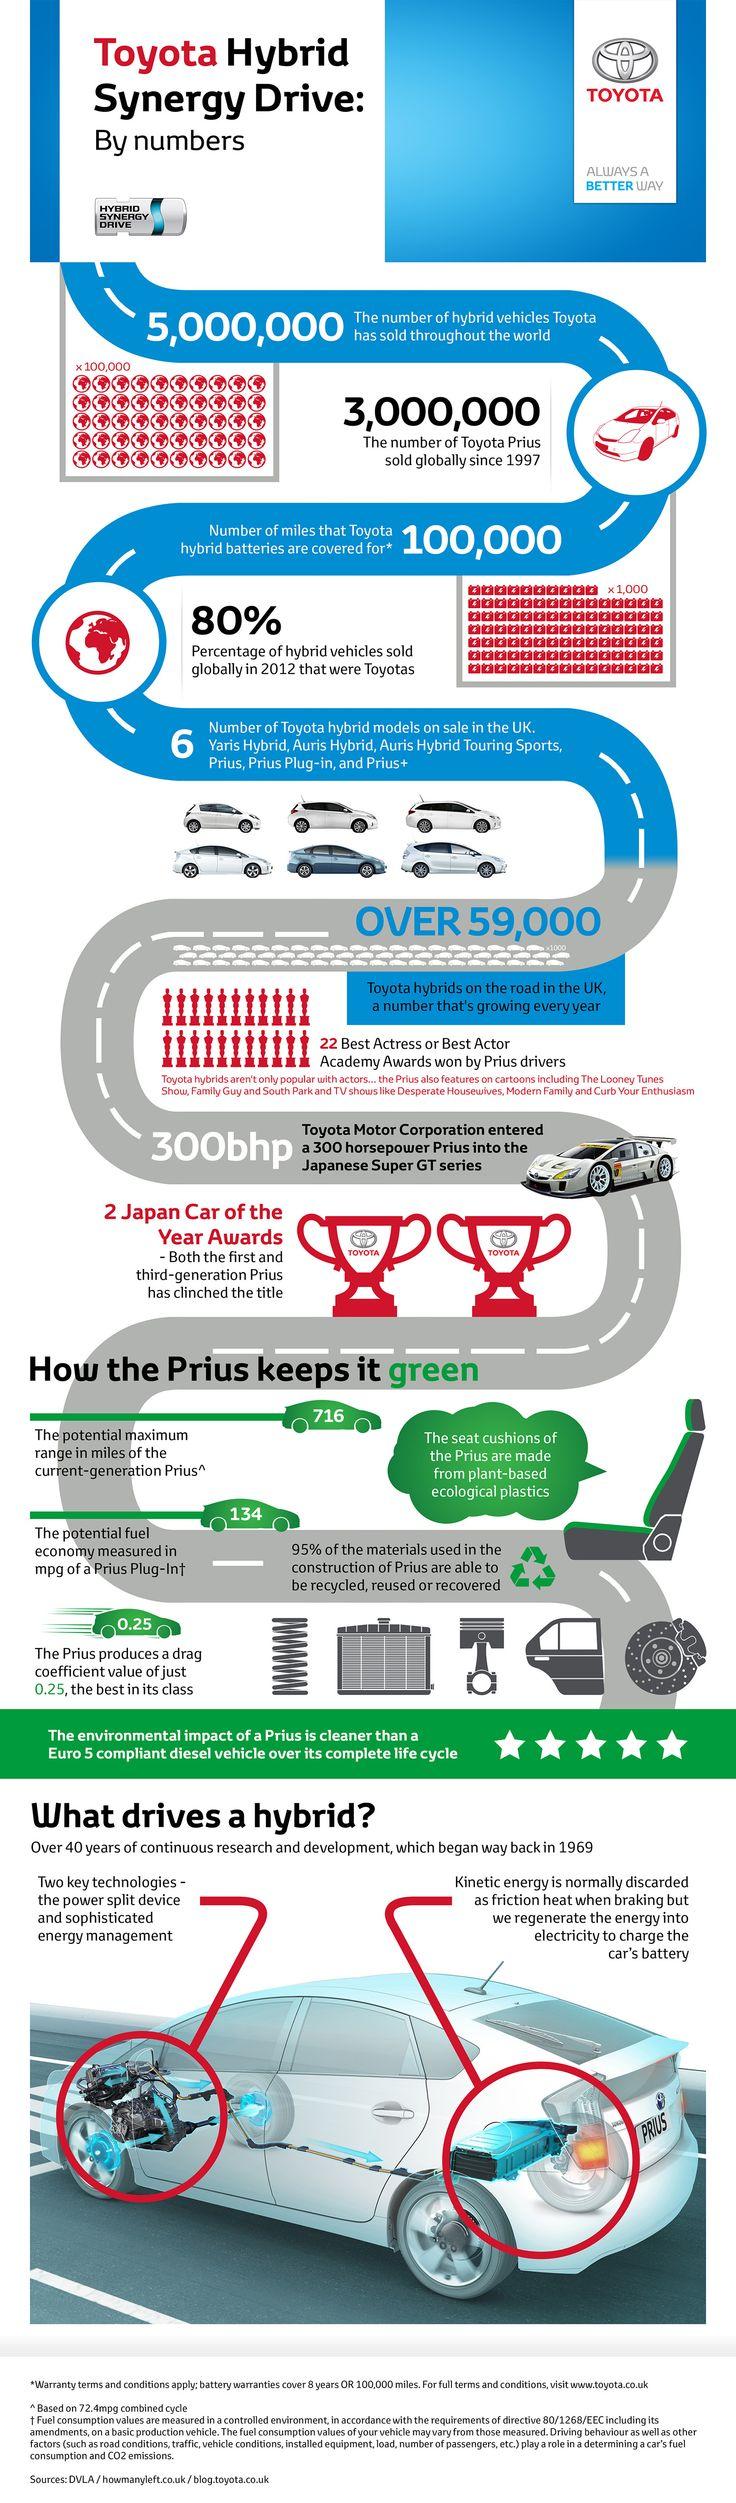 Toyota Hybrid infographic